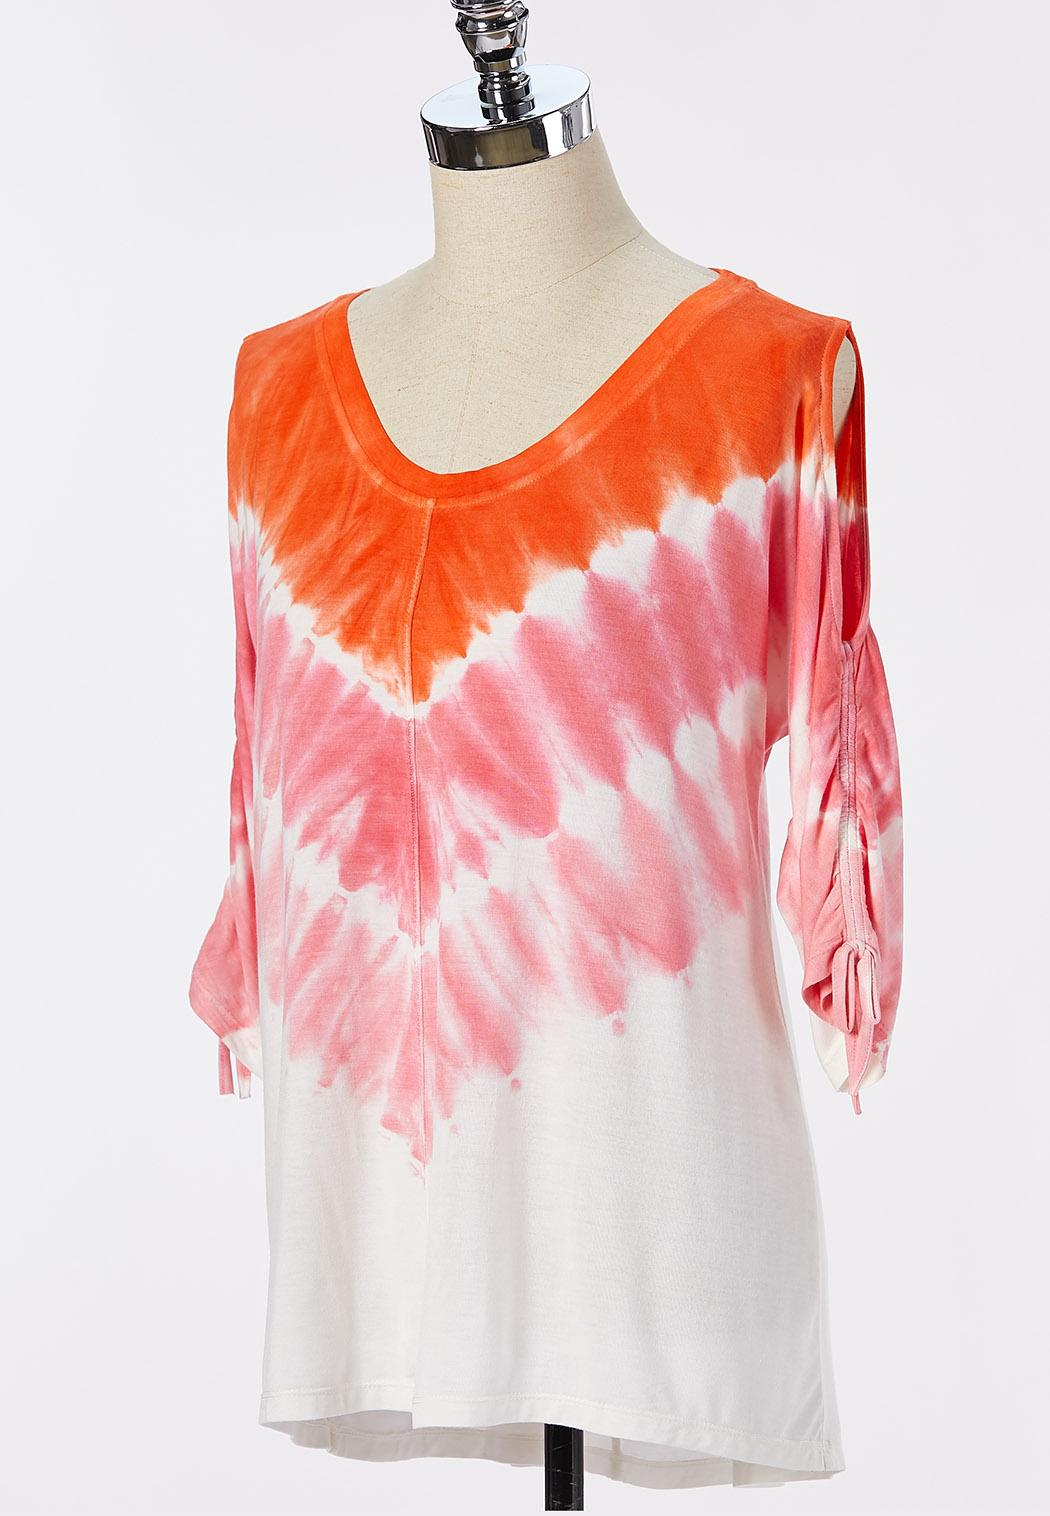 Sunset Tie Dye Top